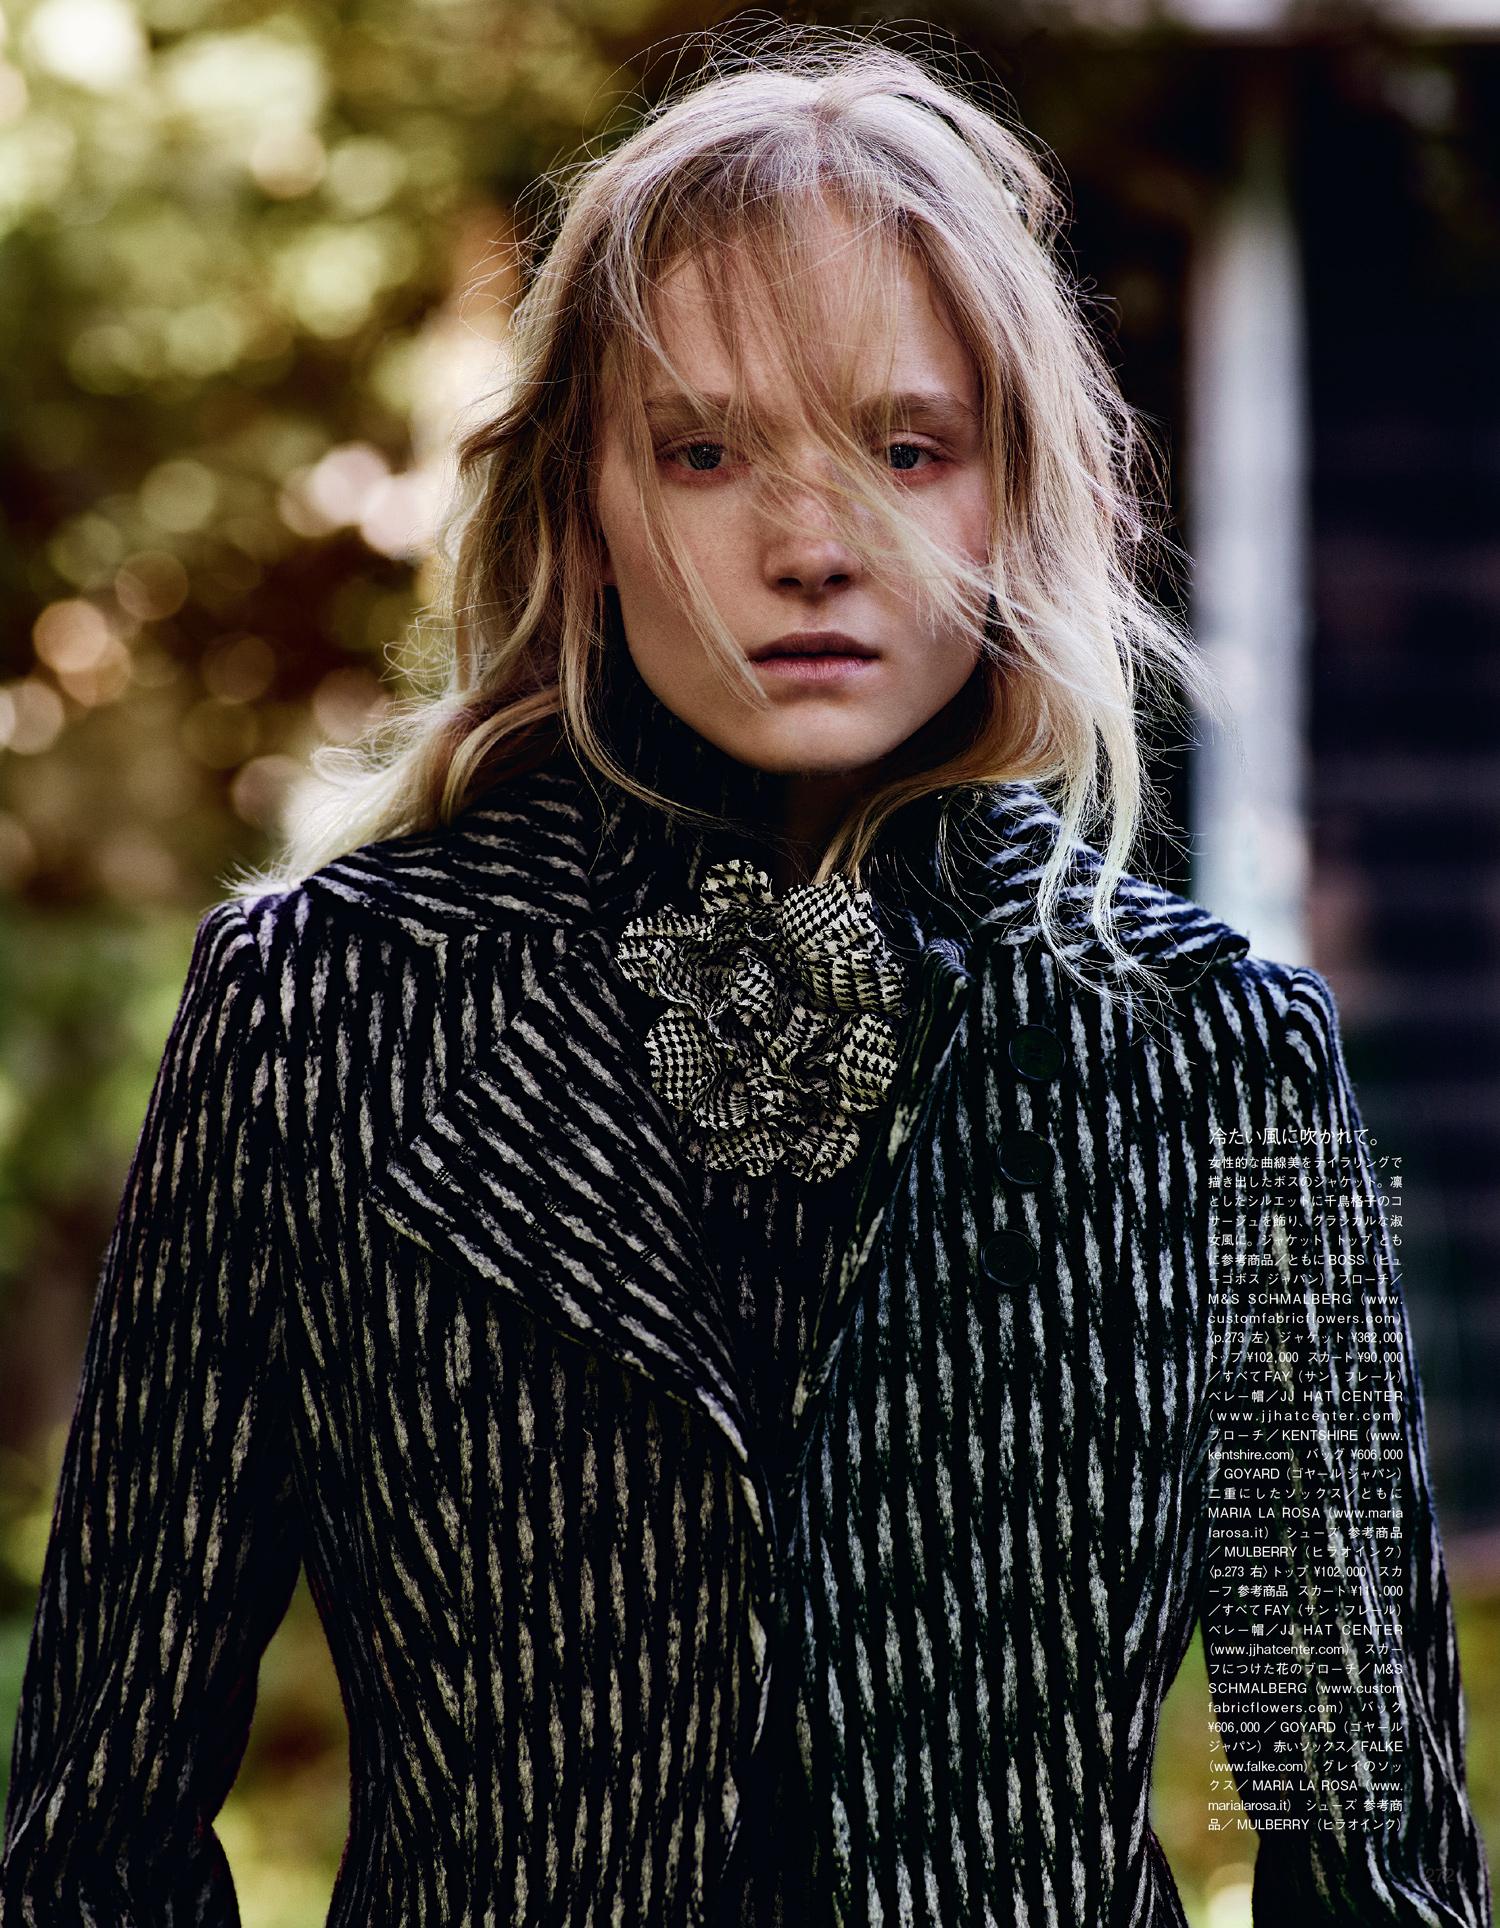 Giovanna-Battaglia-Into-the-Woods-Vogue-Japan-January-2016-3.jpg